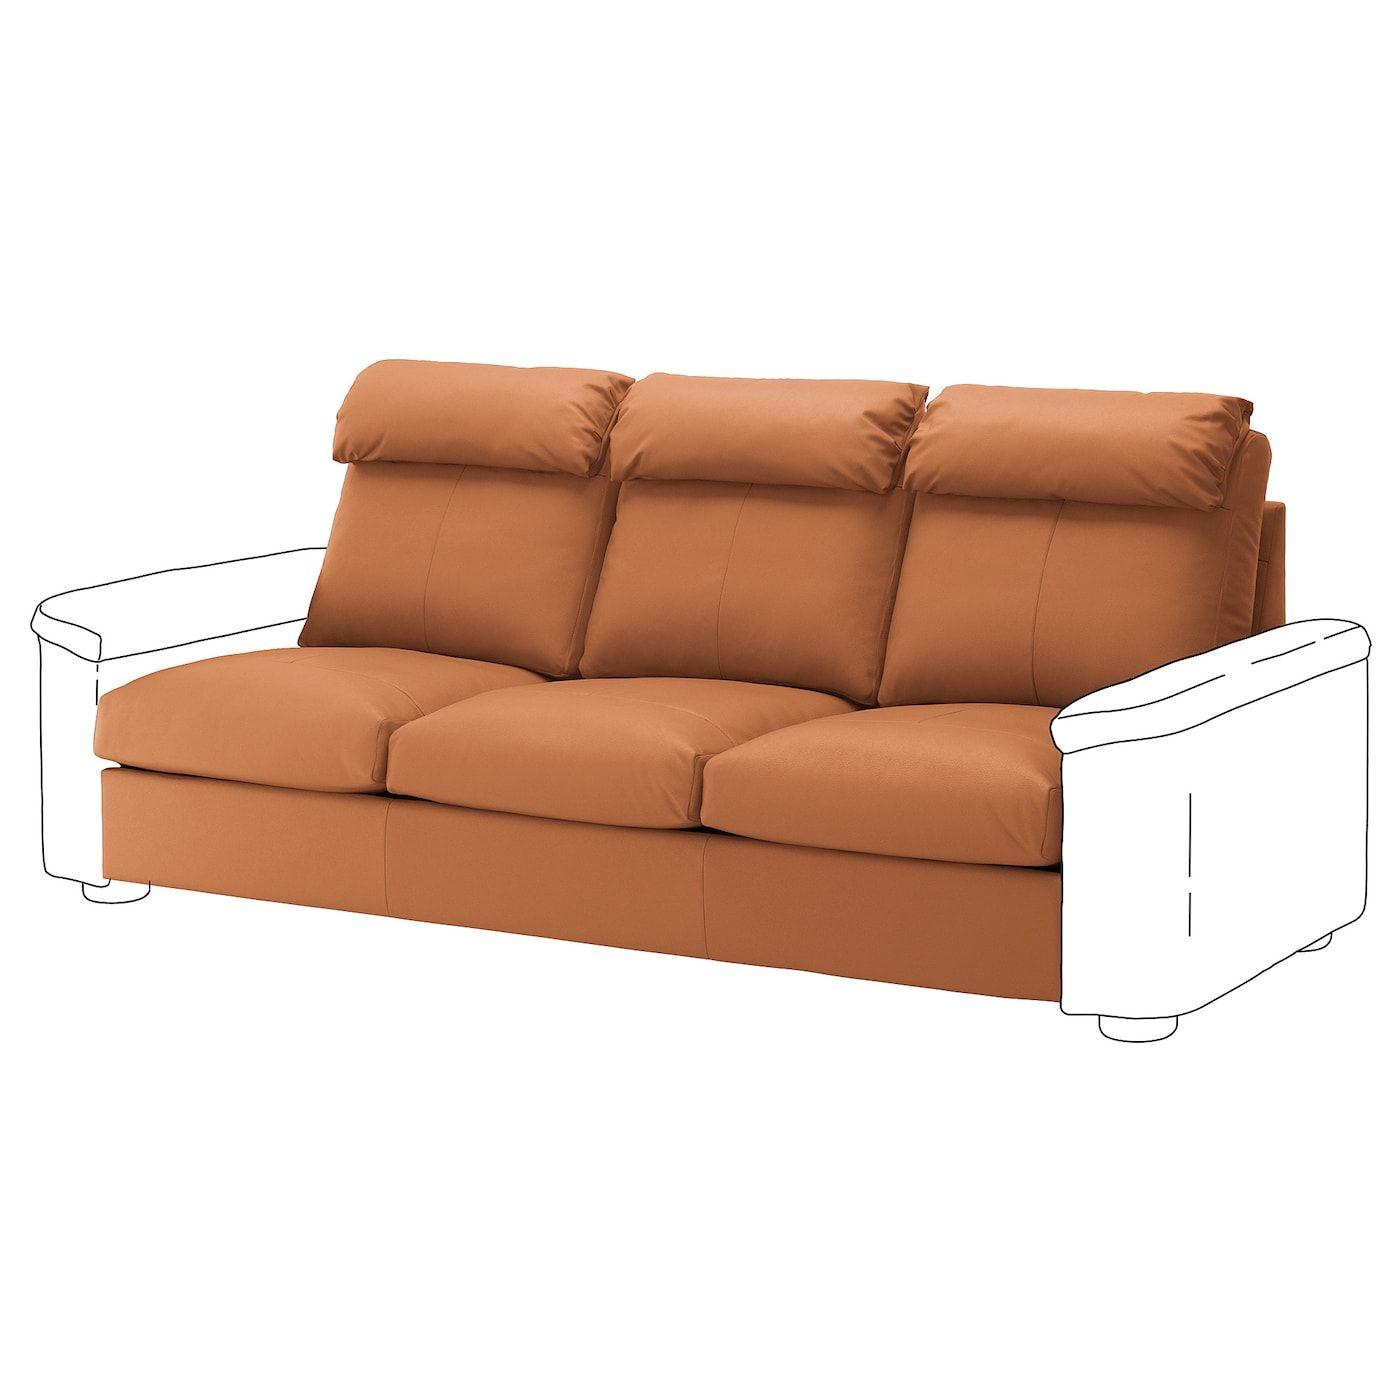 Bomstad Golden Brown Accent Chair Wayfair: LIDHULT Sofa Section Grann/Bomstad Golden Brown